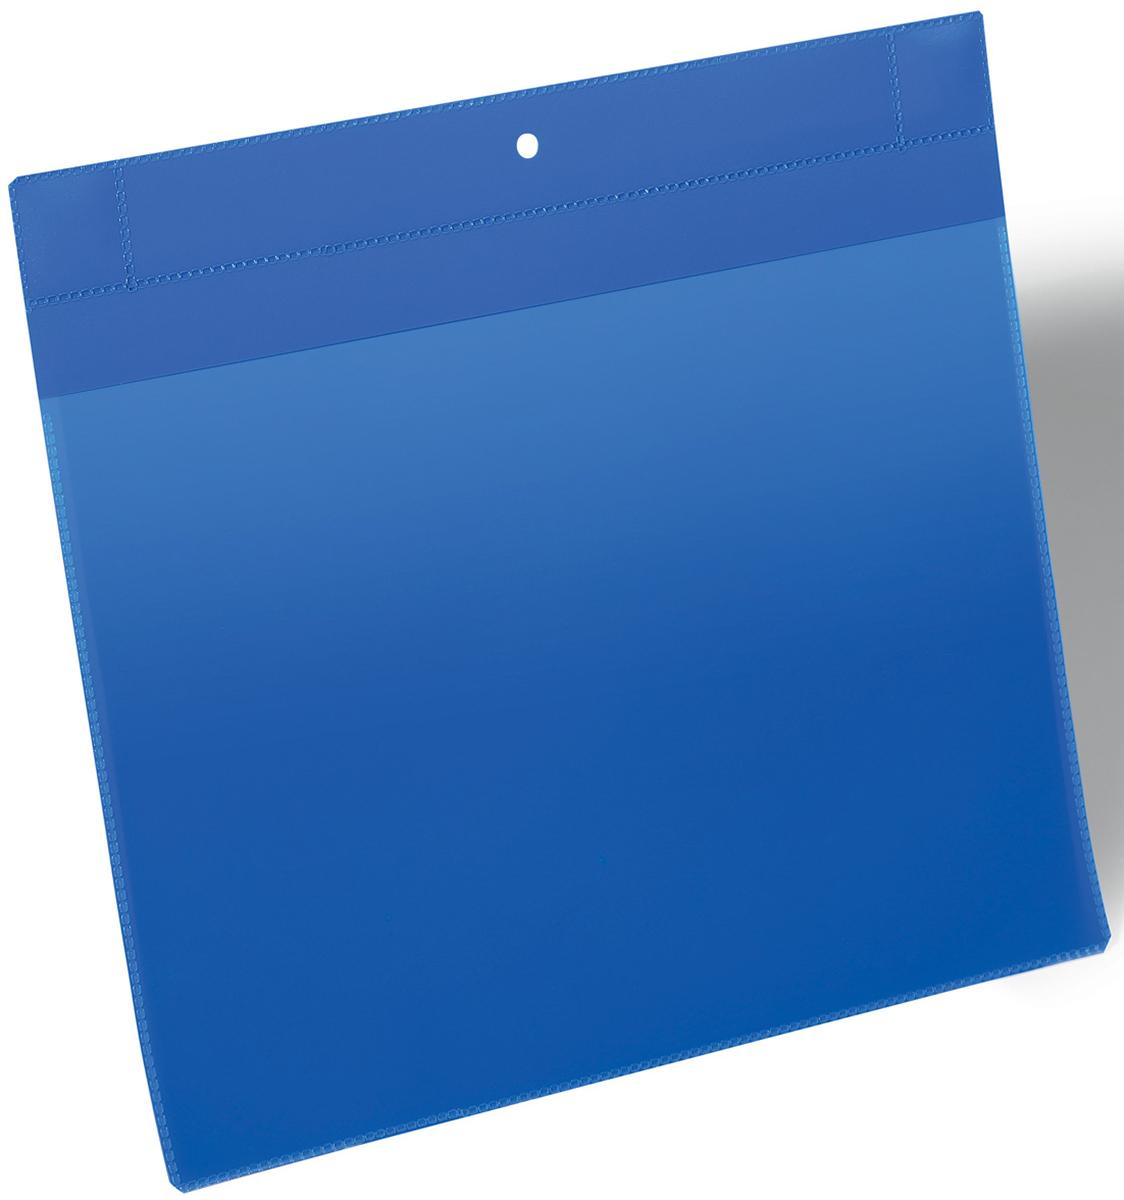 Durable Карман для маркировки и хранения документов цвет синий